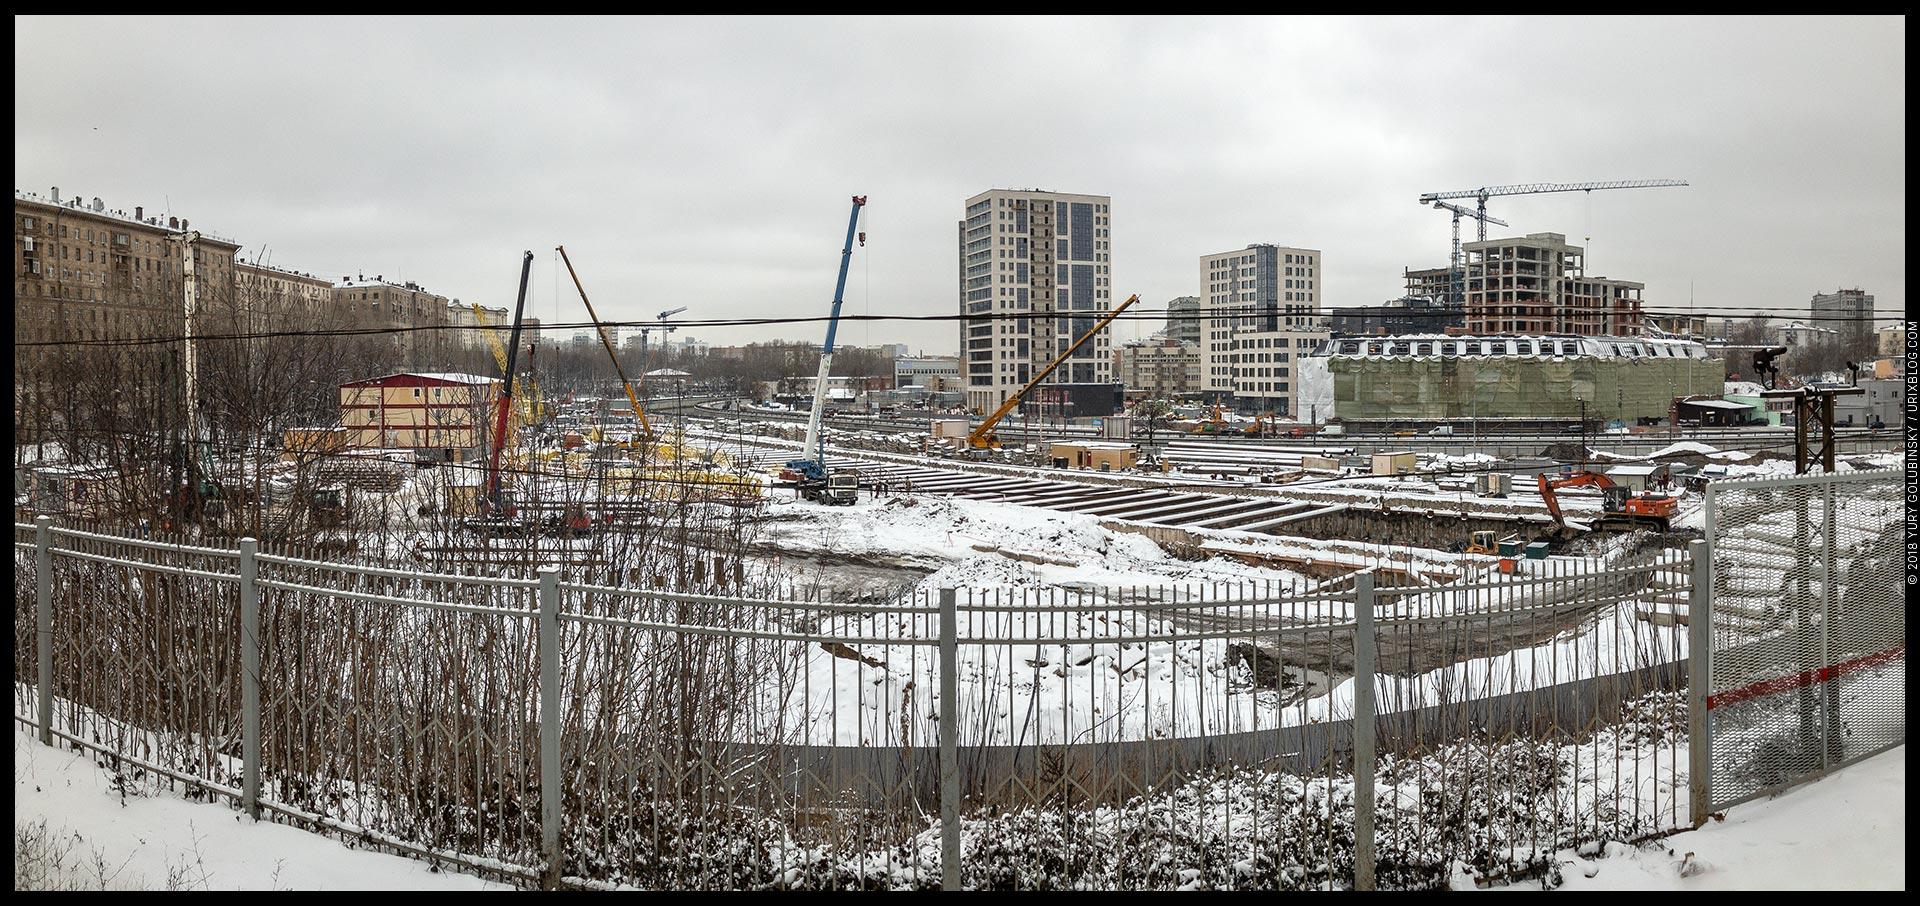 станция метро, Электрозаводская, котлован, зима, снег, Москва, Россия, панорама